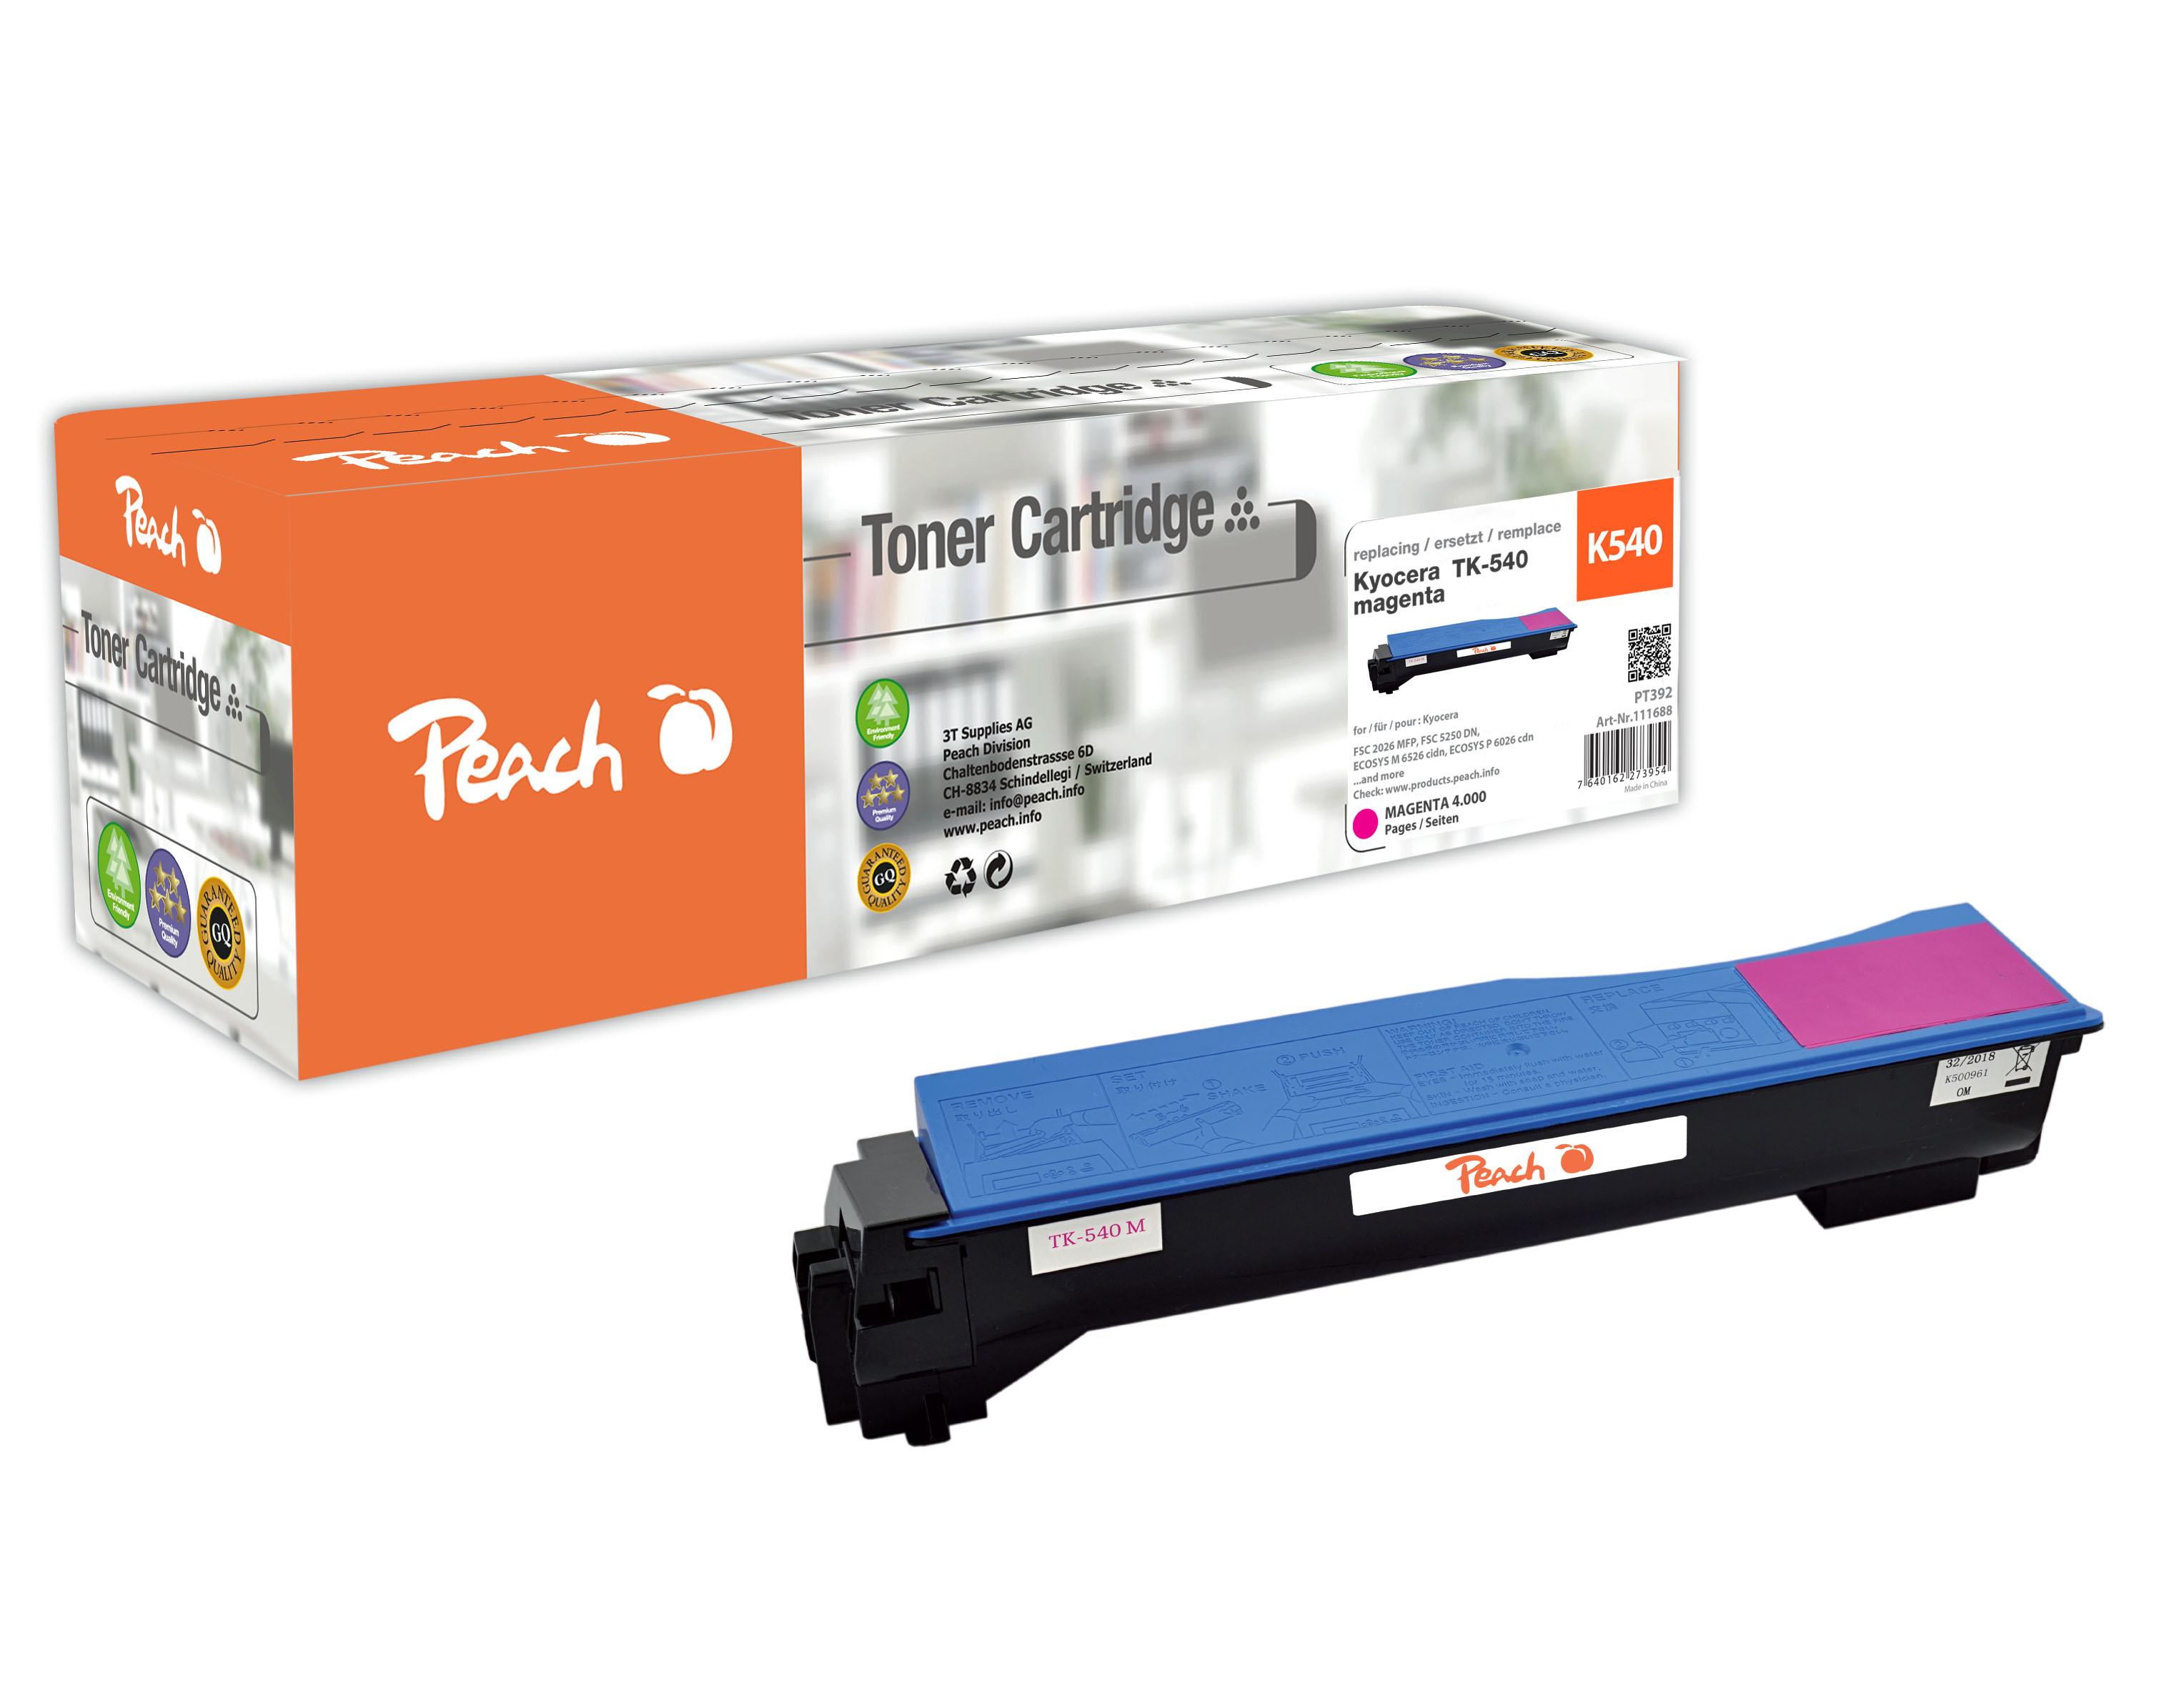 Peach  Tonermodul magenta, kompatibel zu Kyocera FSC 5100 DN